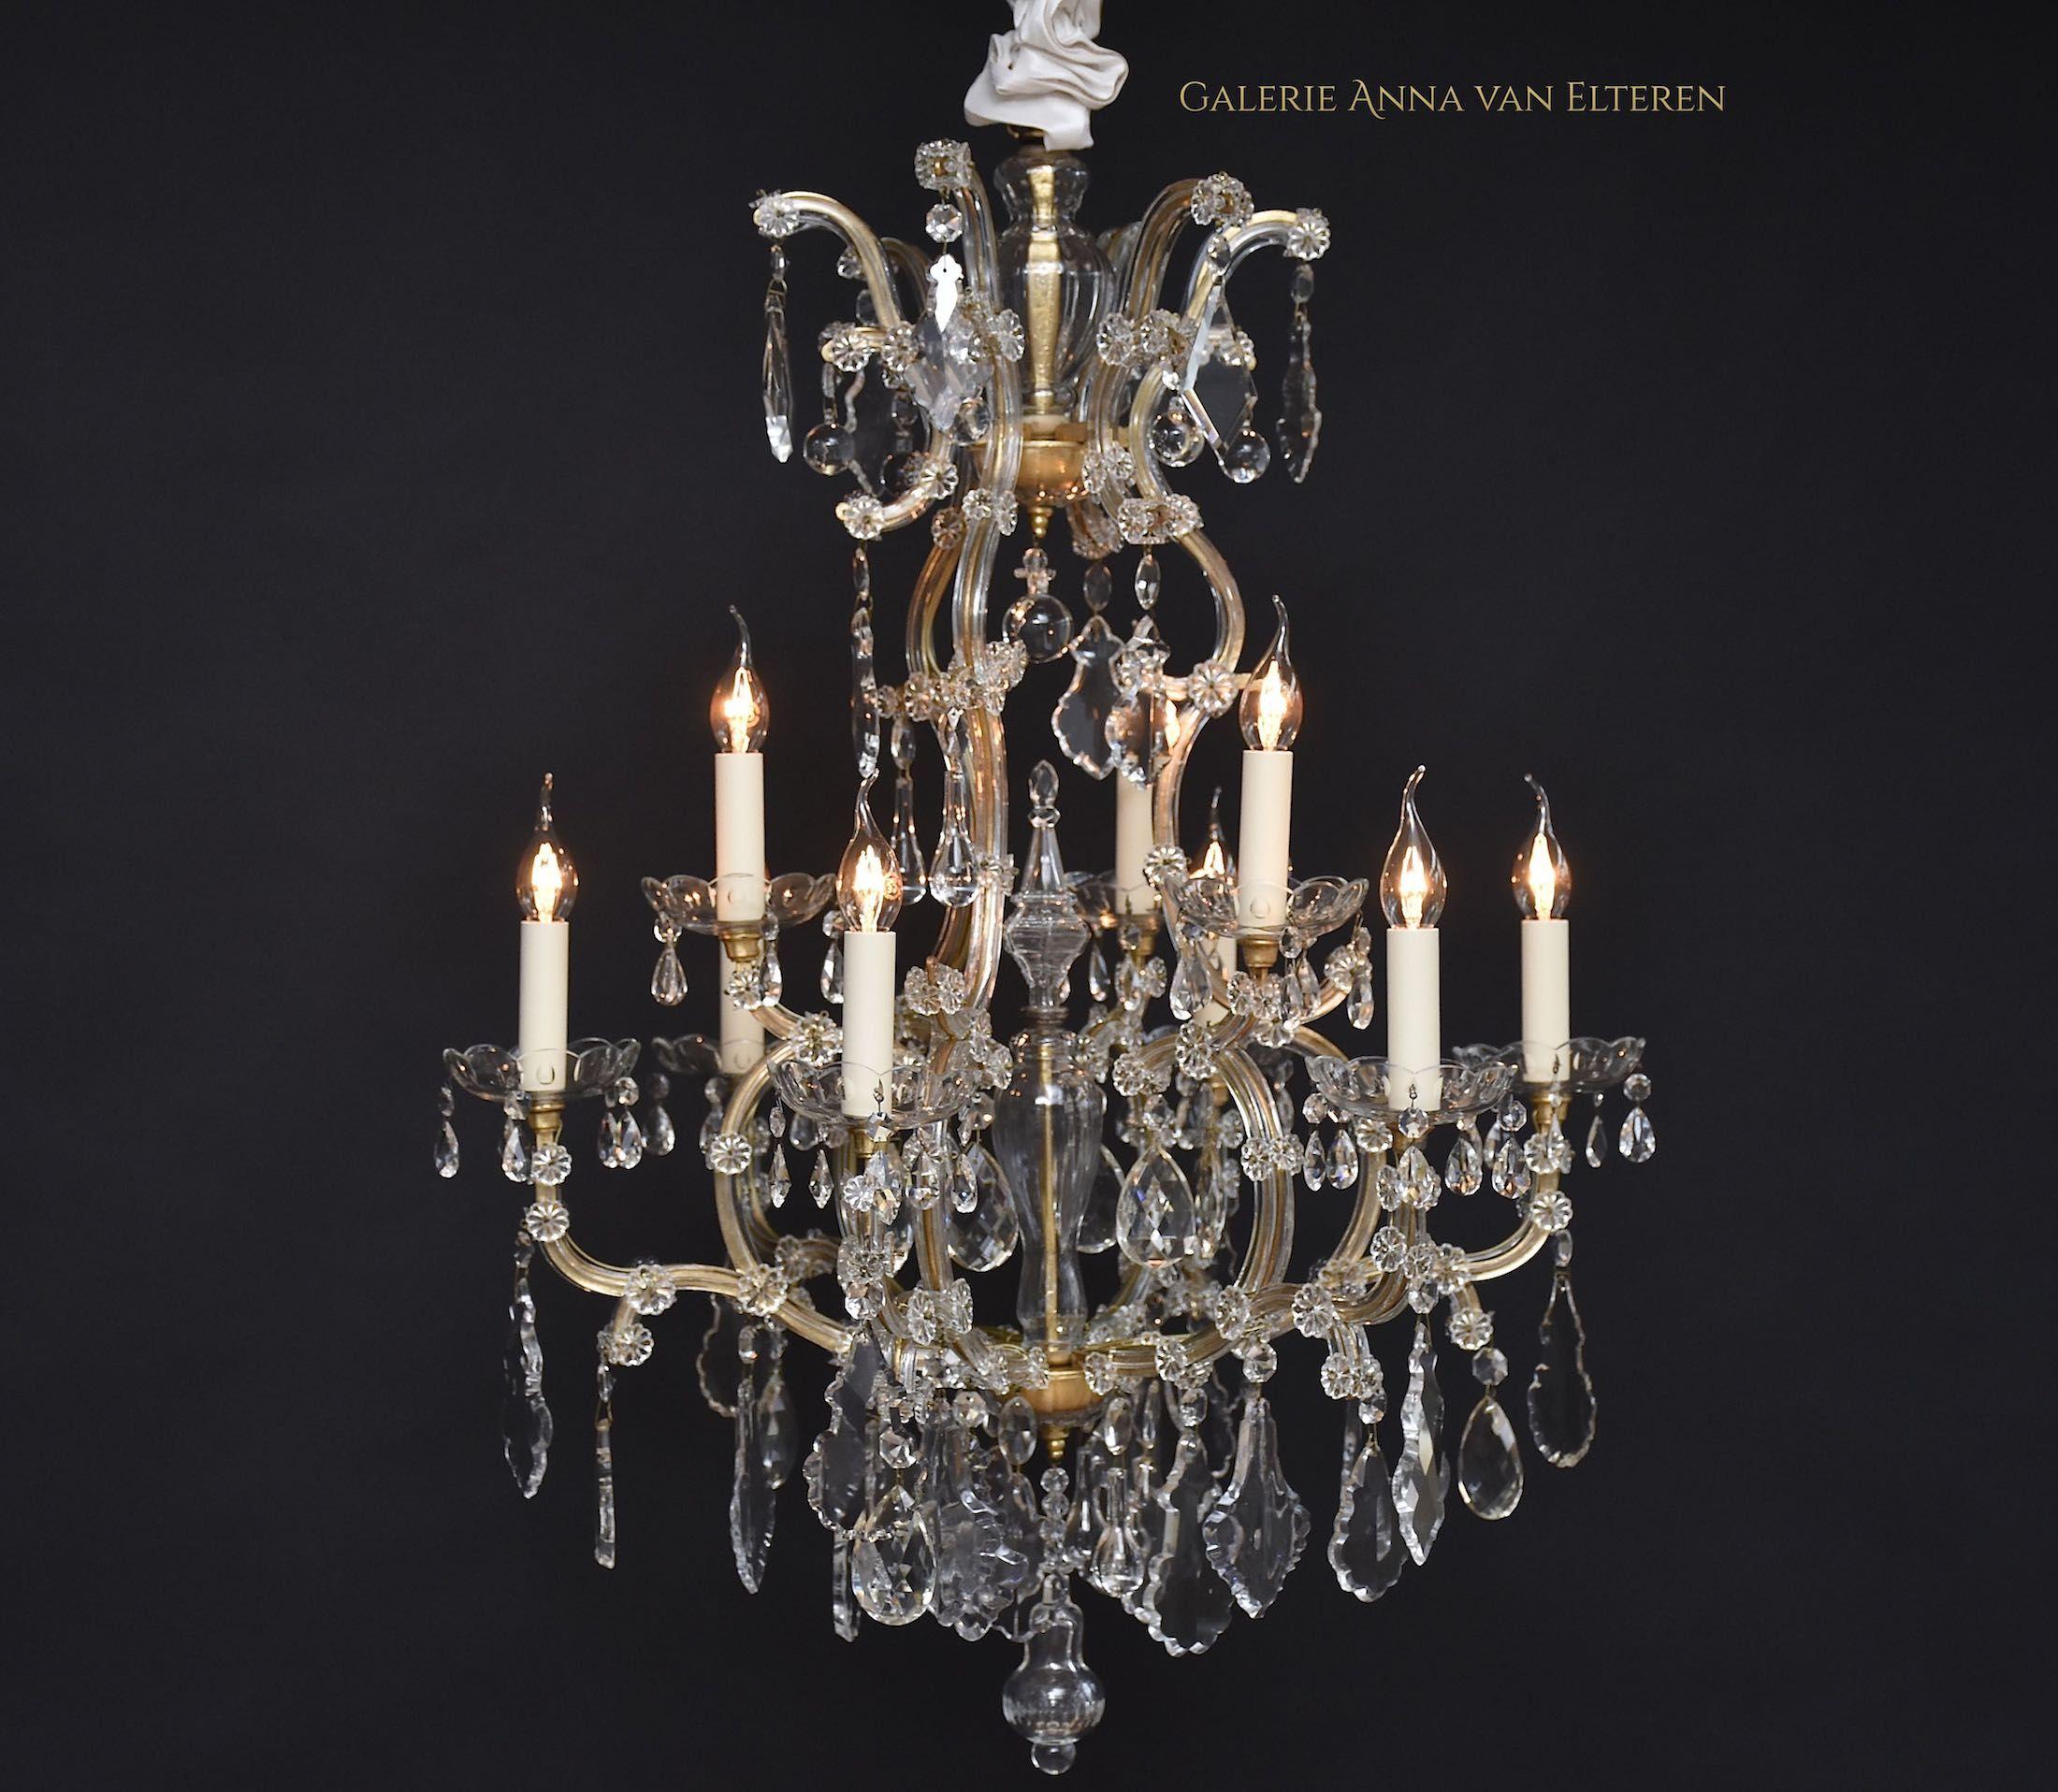 Old Murano chandelier crystal chandeliers restorations